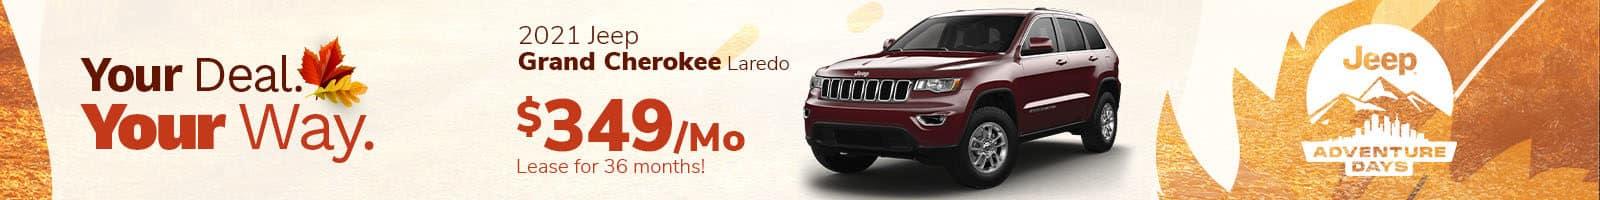 Lease a new Jeep Grand Cherokee near Brownsburg, Indiana